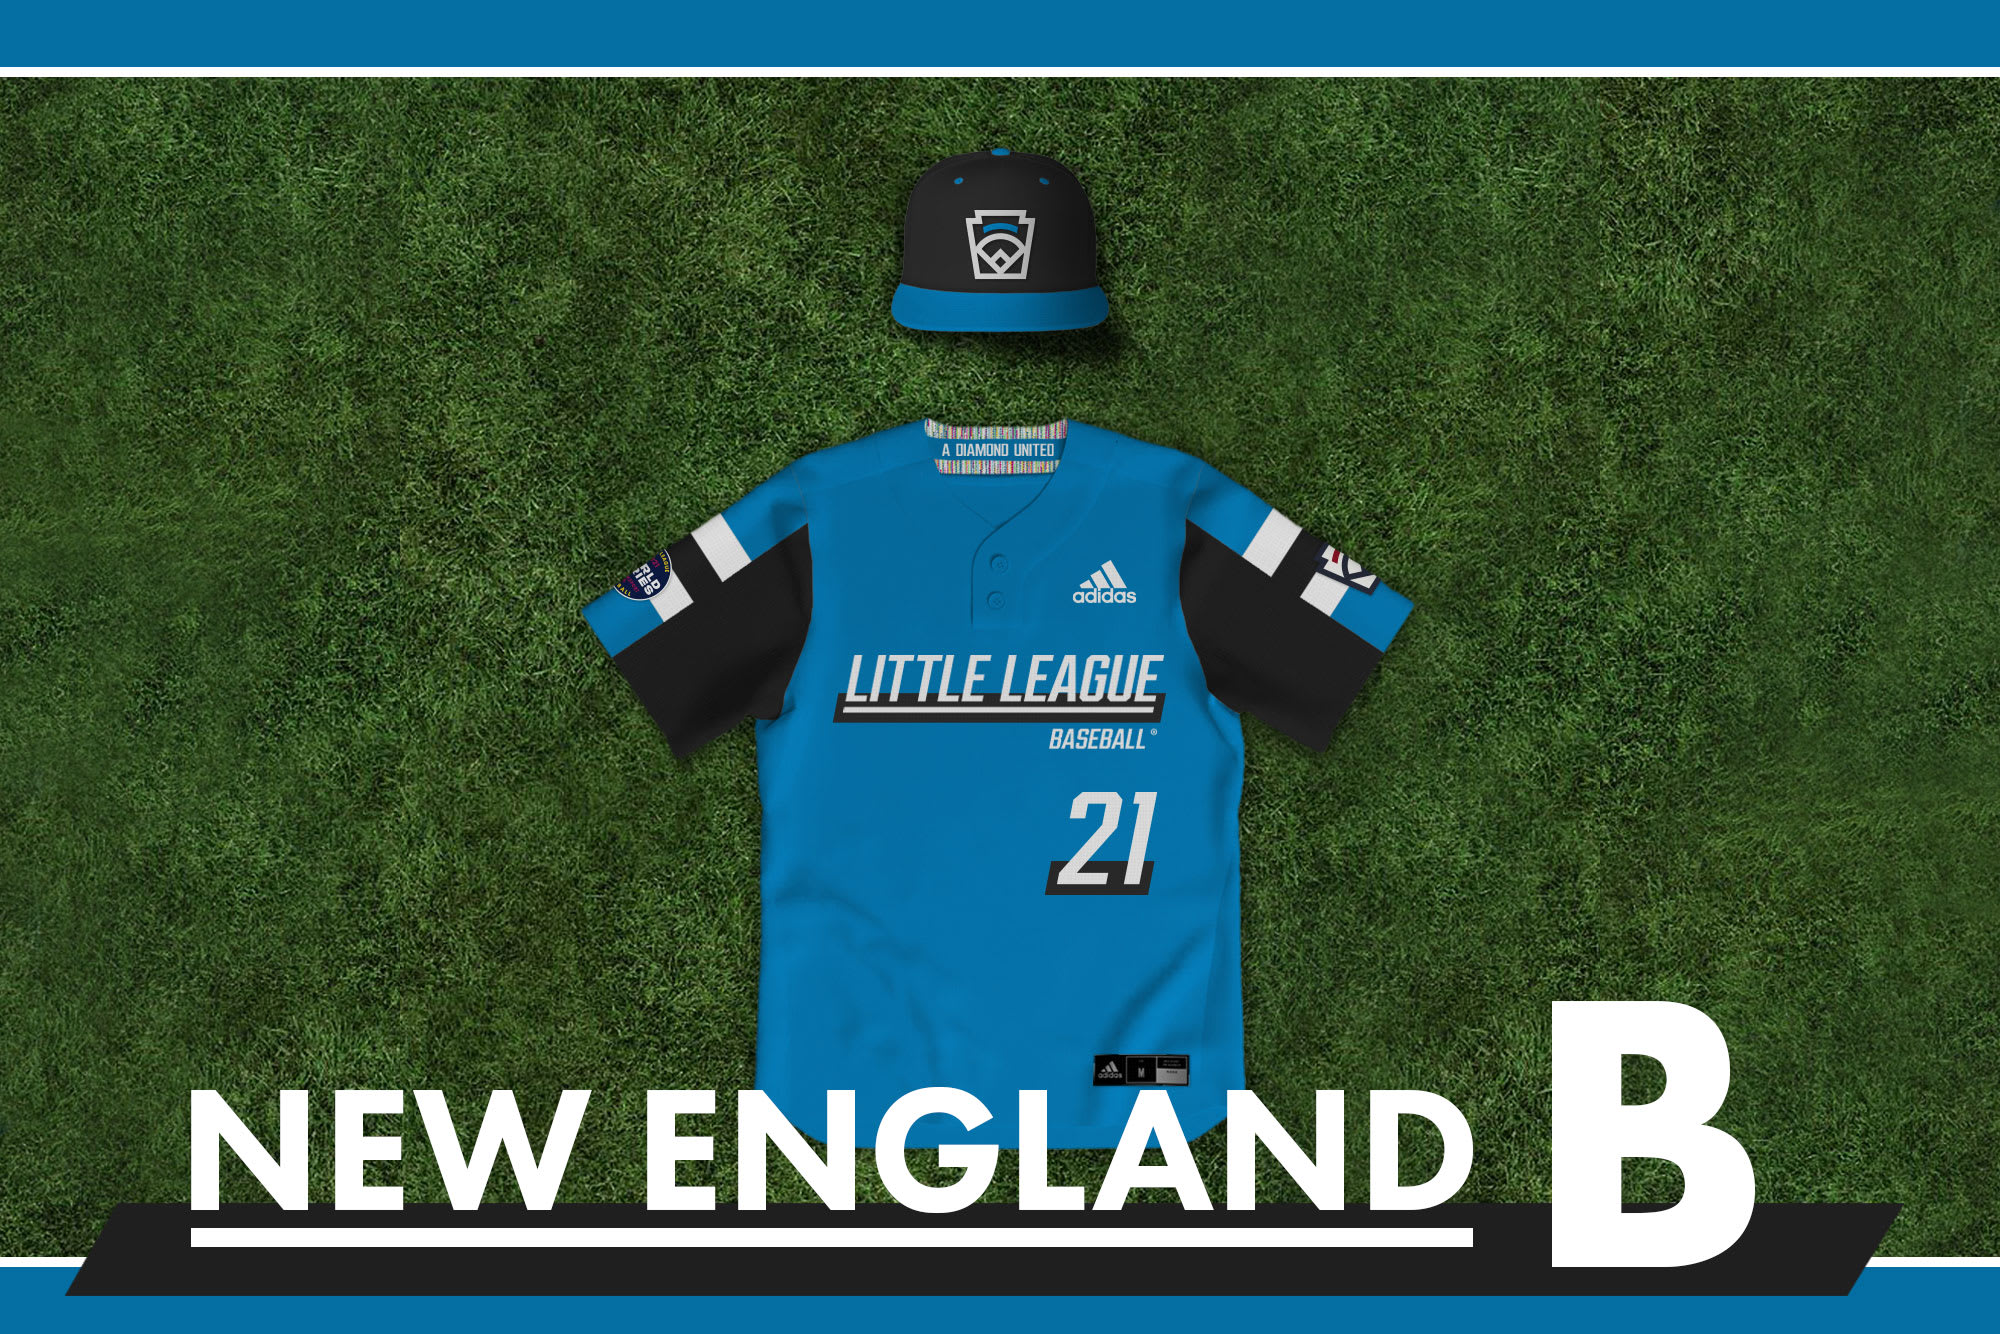 LLB New England B uniform